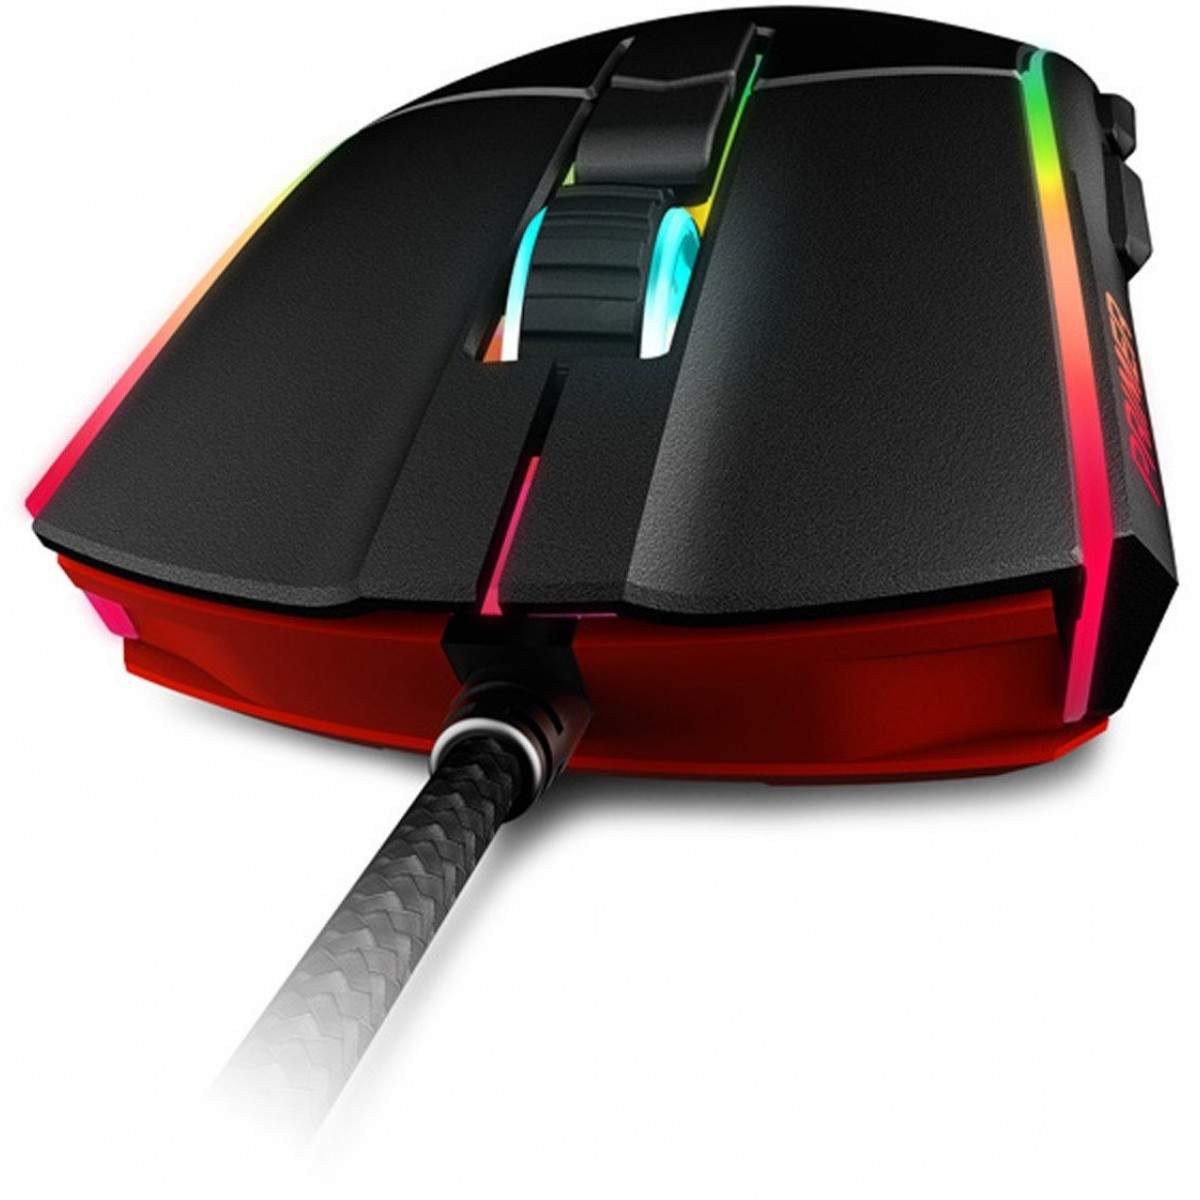 Mouse Gamer XPG, Primer, 12000DPI, RGB, 7 Botões, Black, PRIMER-BKCWW